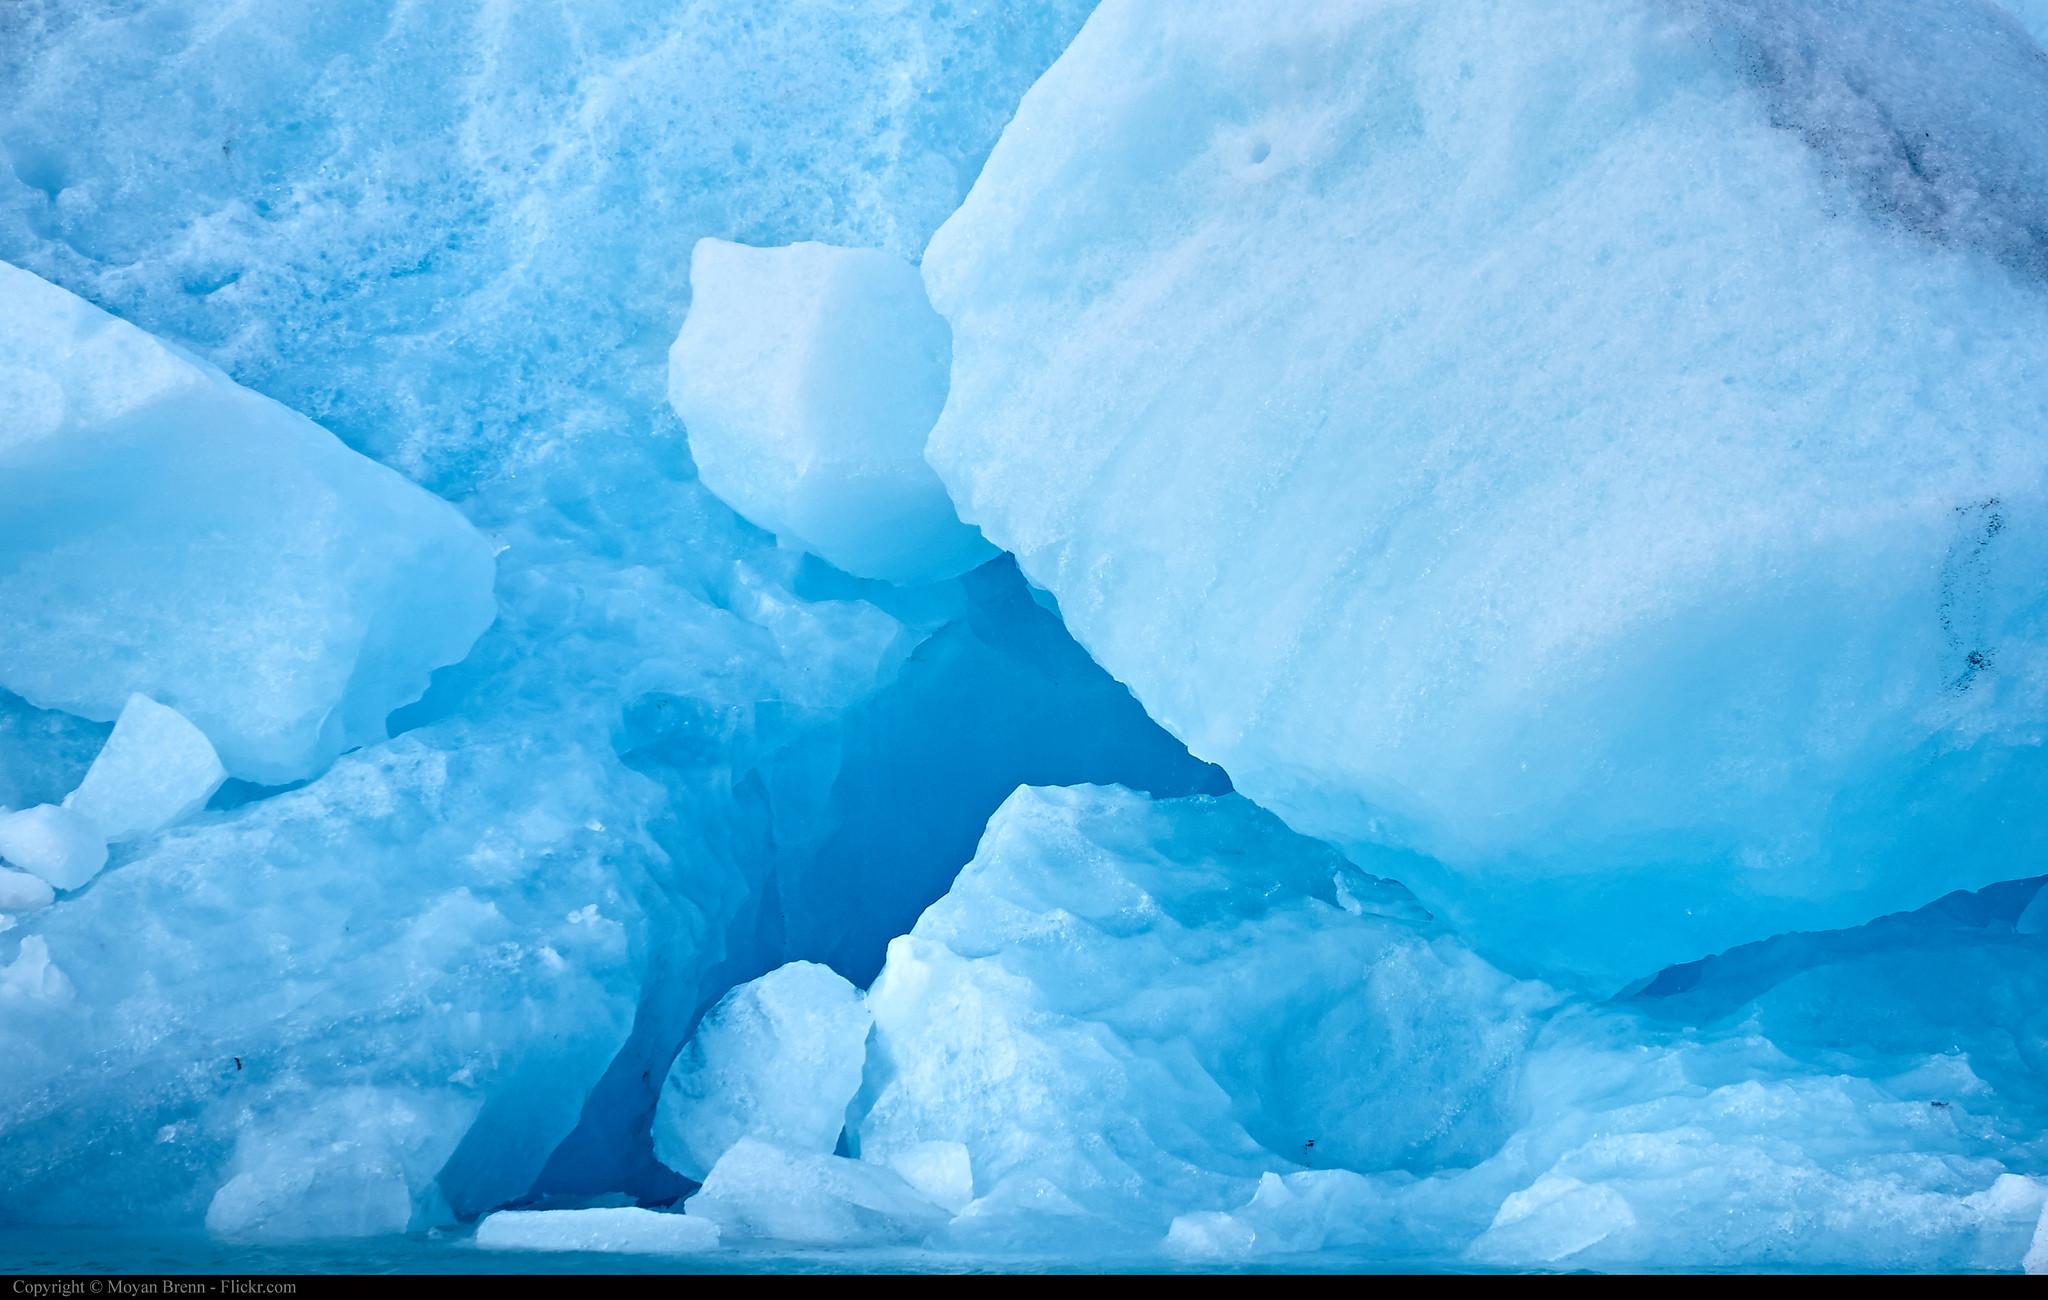 blue ice wallpaper - photo #10